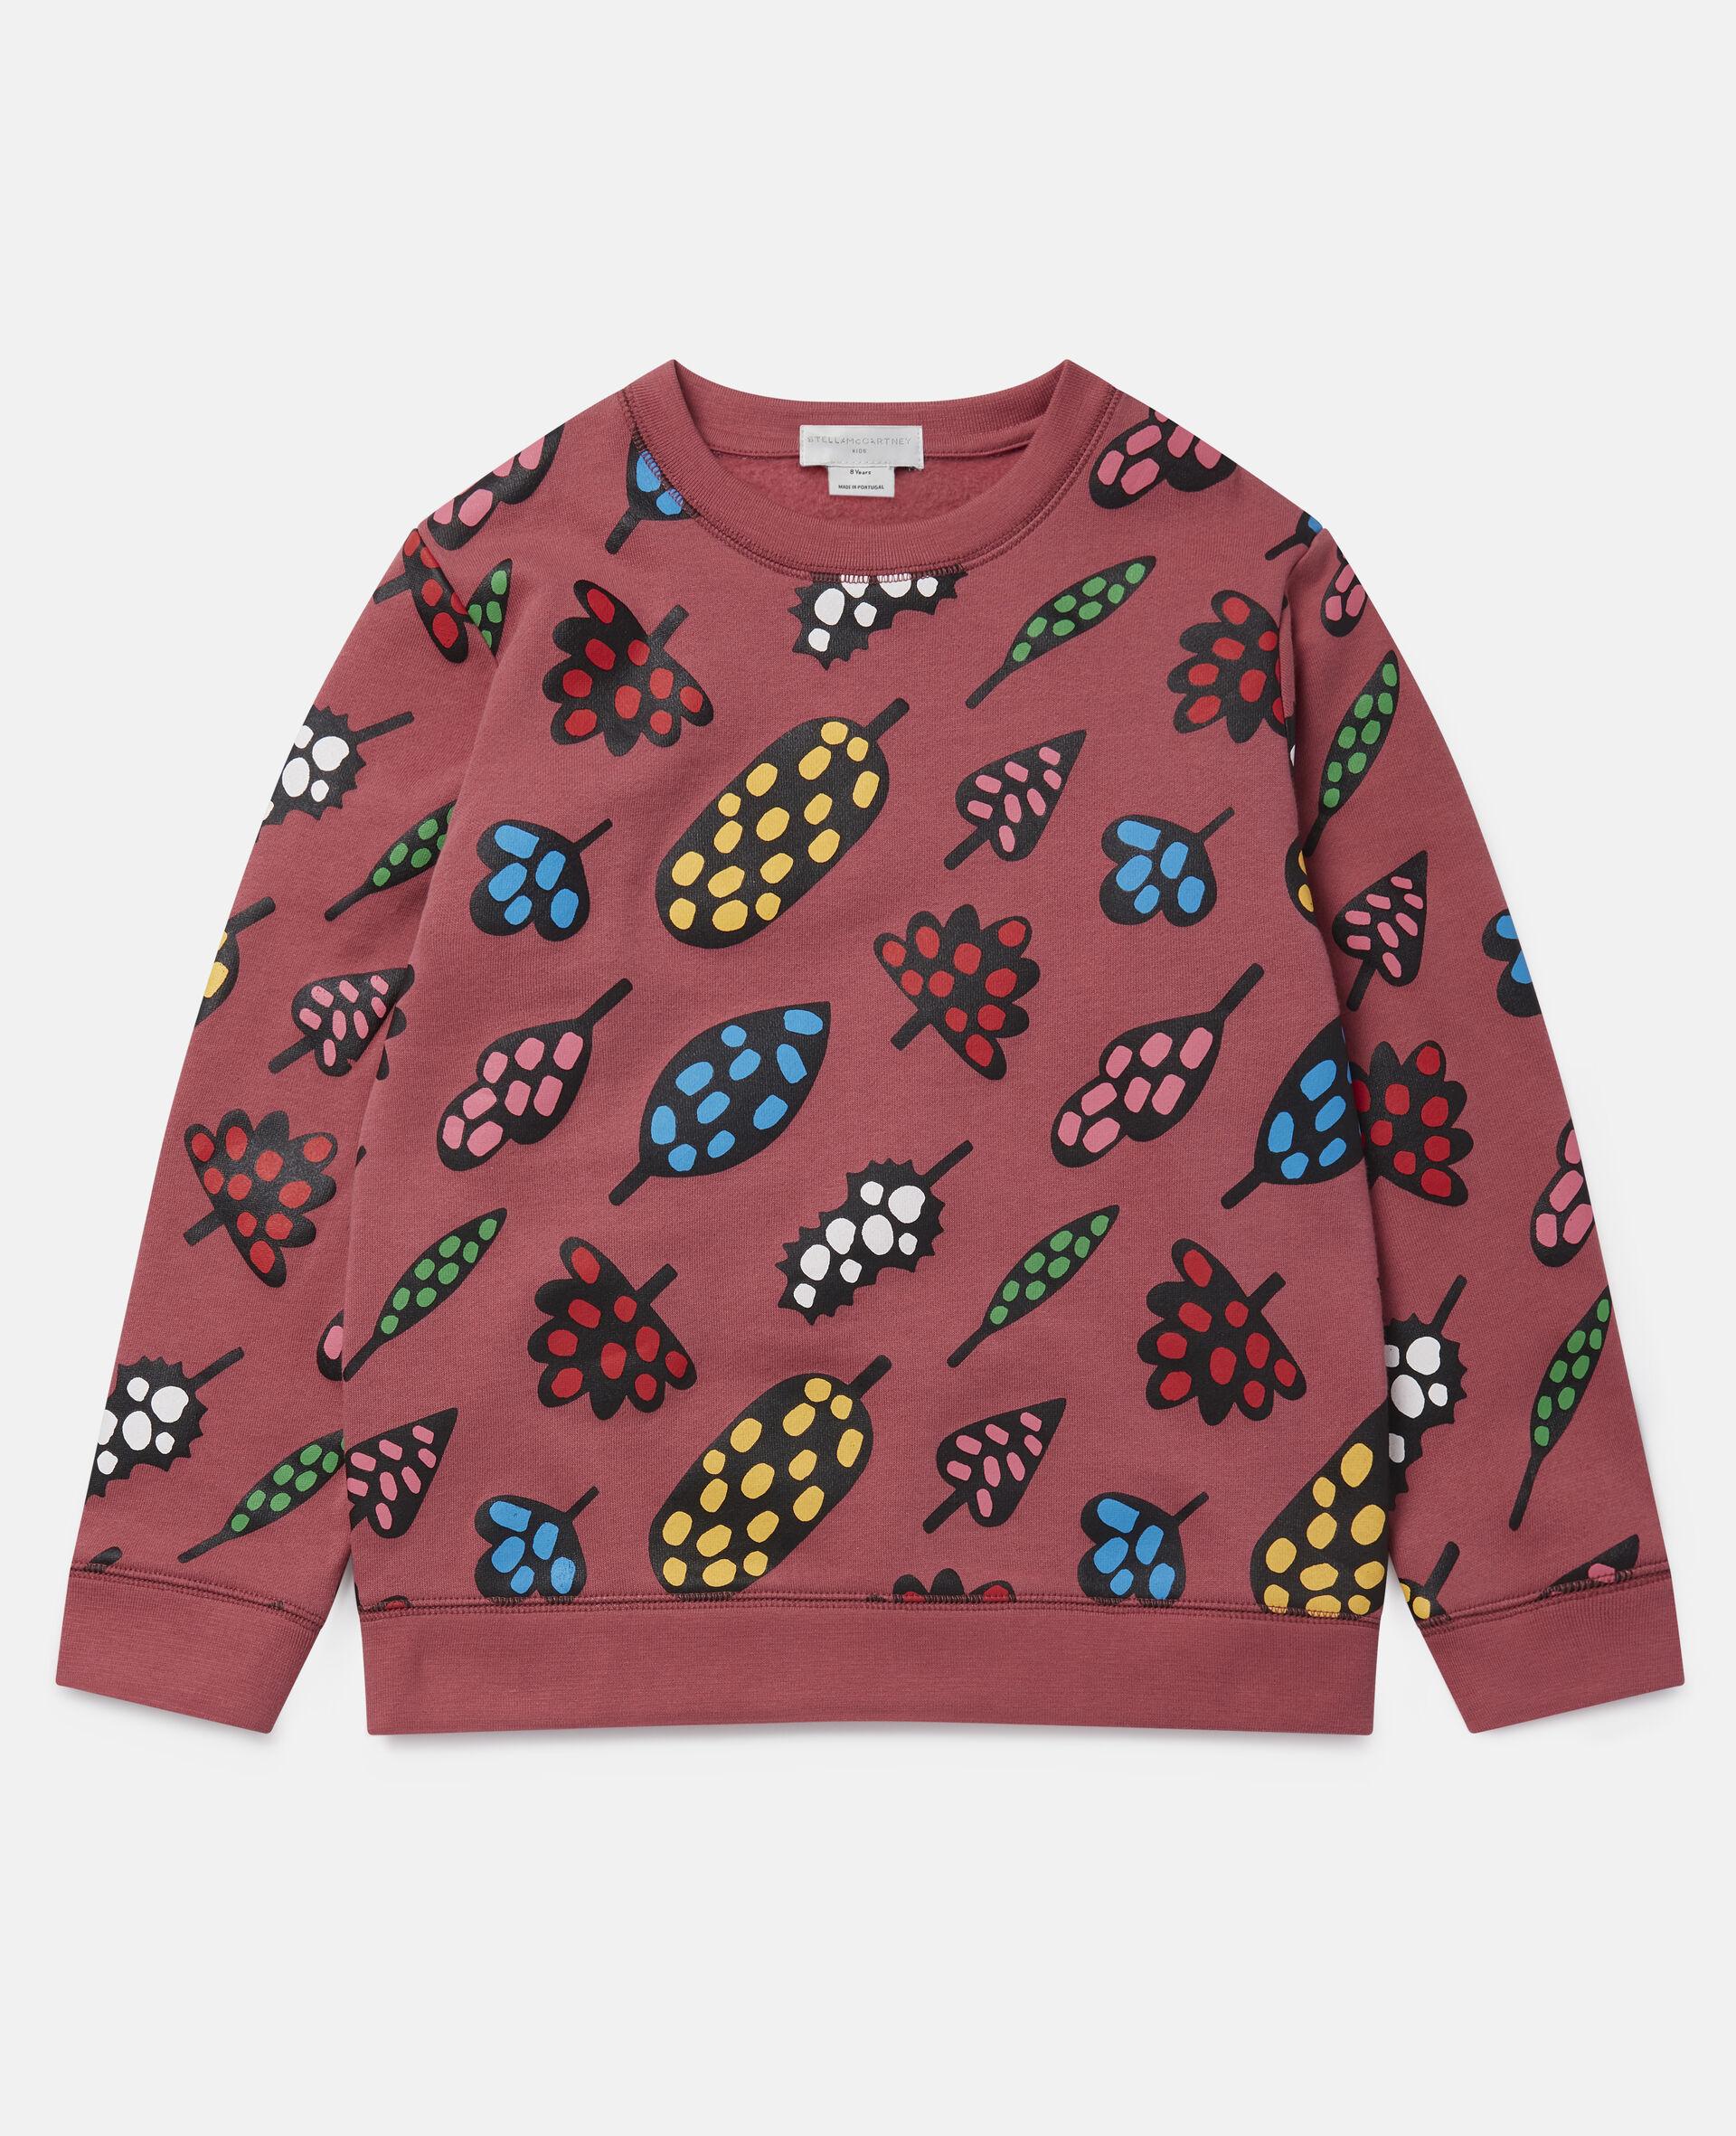 Spotty Leaves Cotton Fleece Sweatshirt -Multicolour-large image number 0